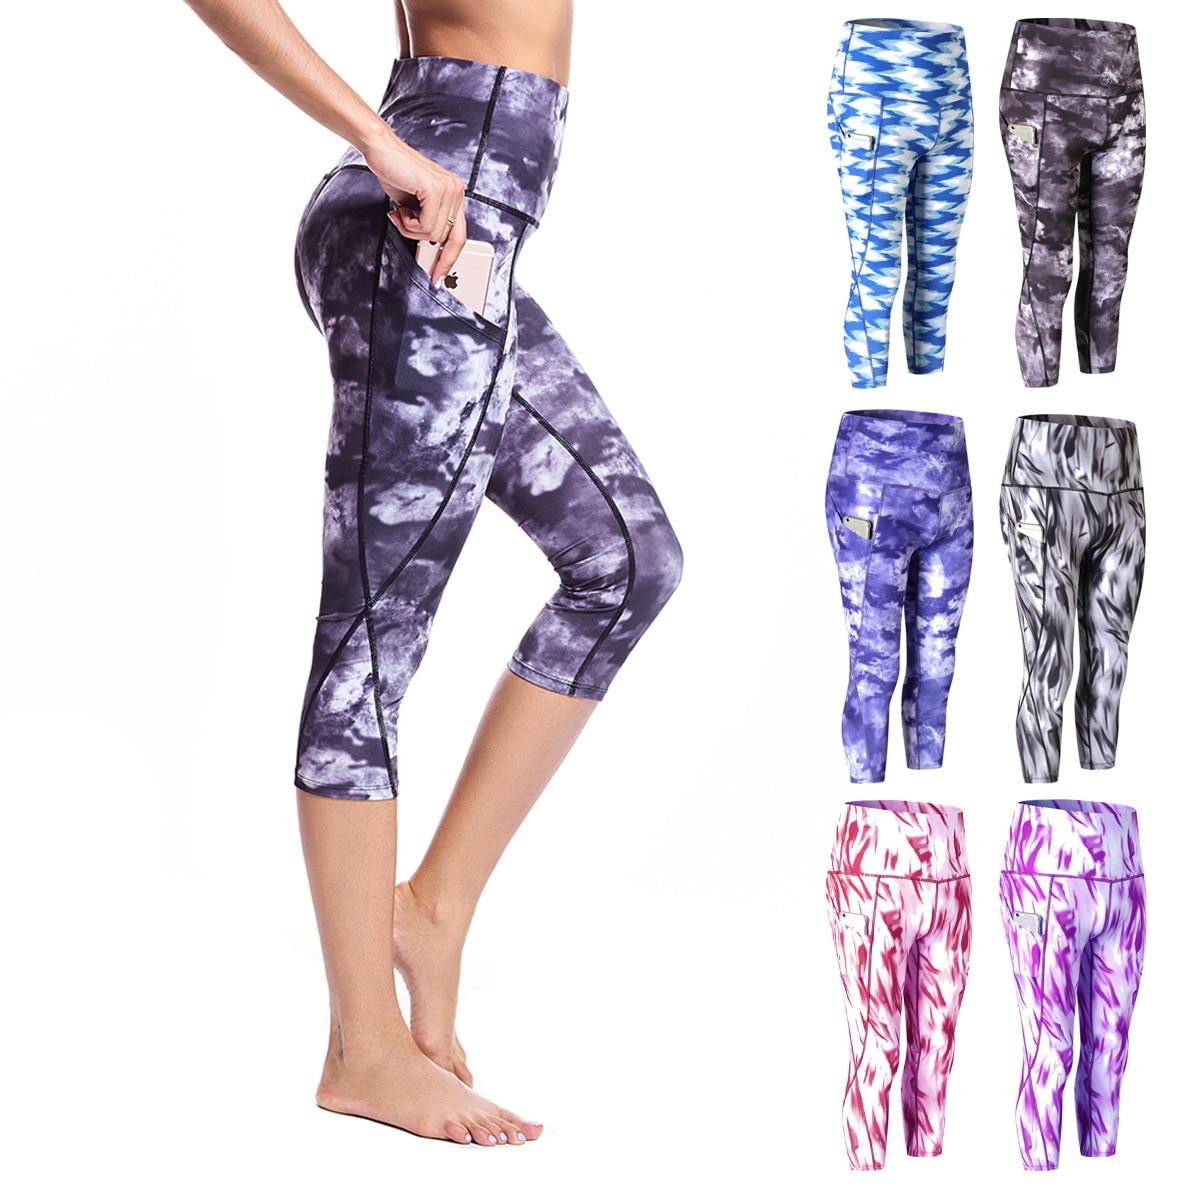 Yoga Tights Woman Sports Fitness Yoga Pants Workout Gym Leggings Sport Women Fitness Seamless Sport Leggings Capris 3/4 Pants